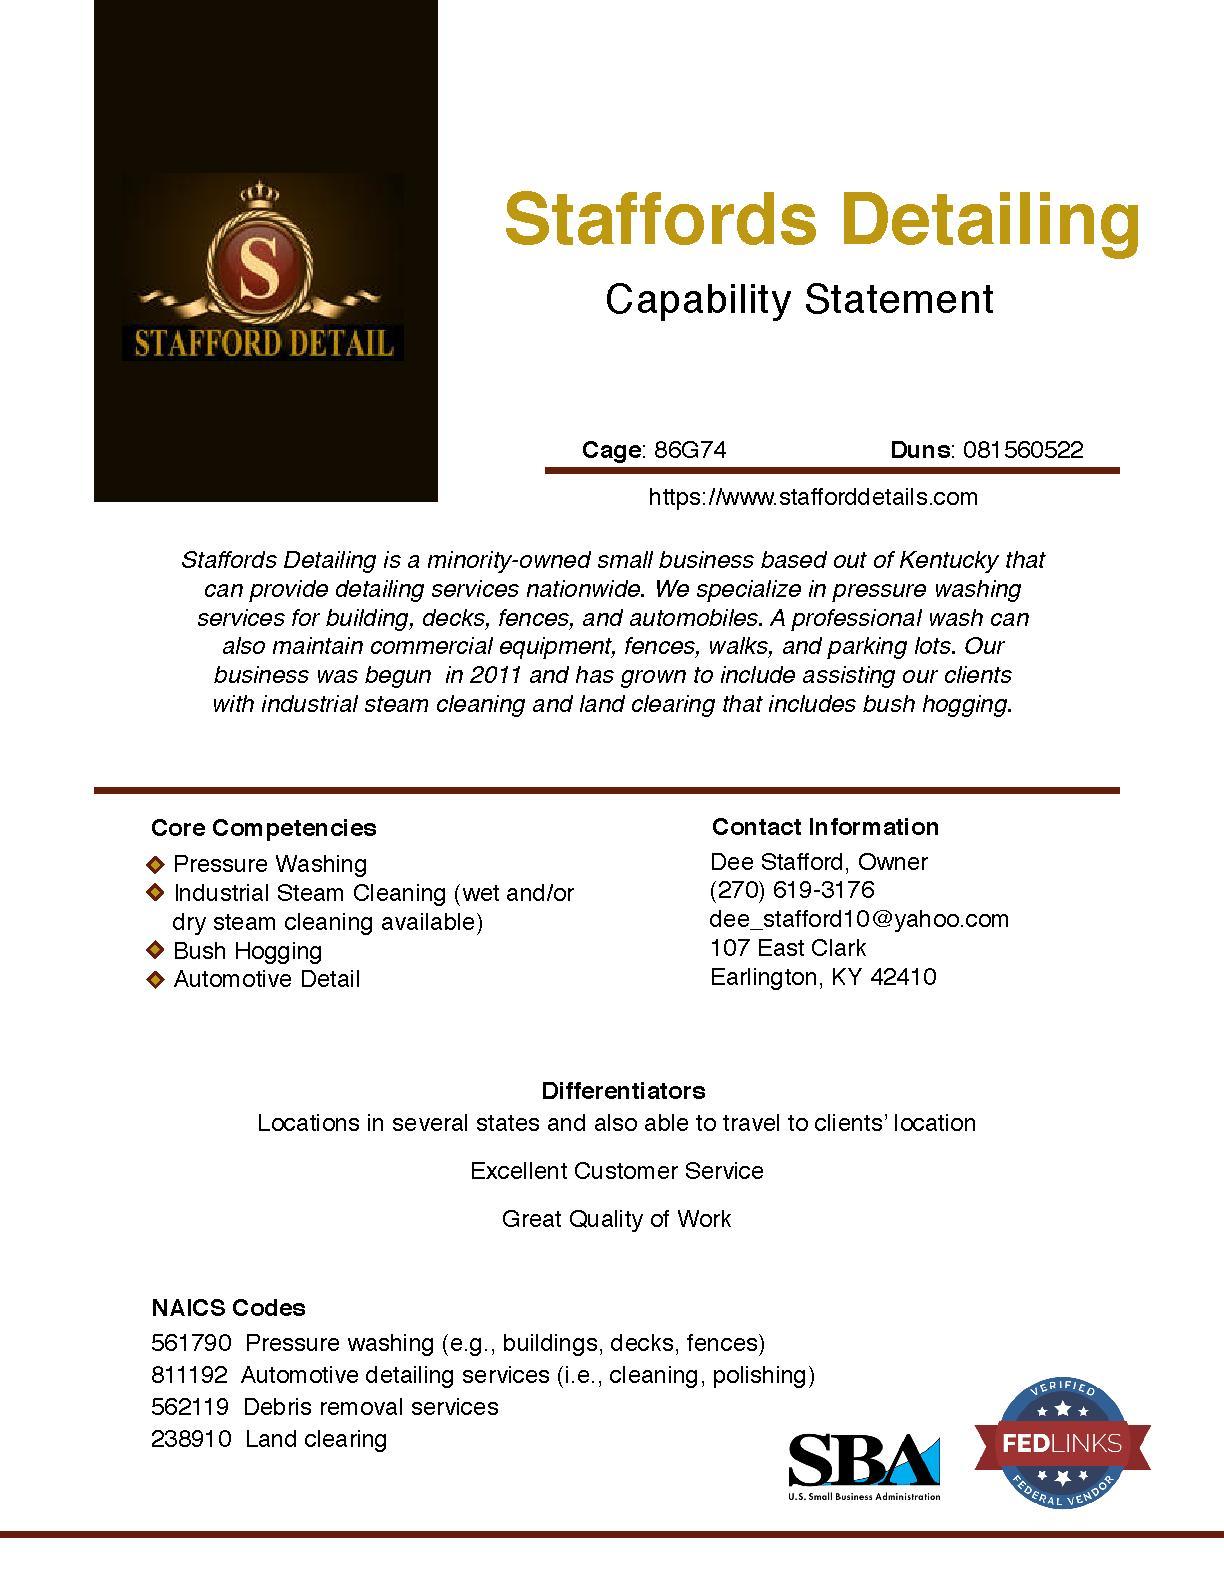 Staffords detailing